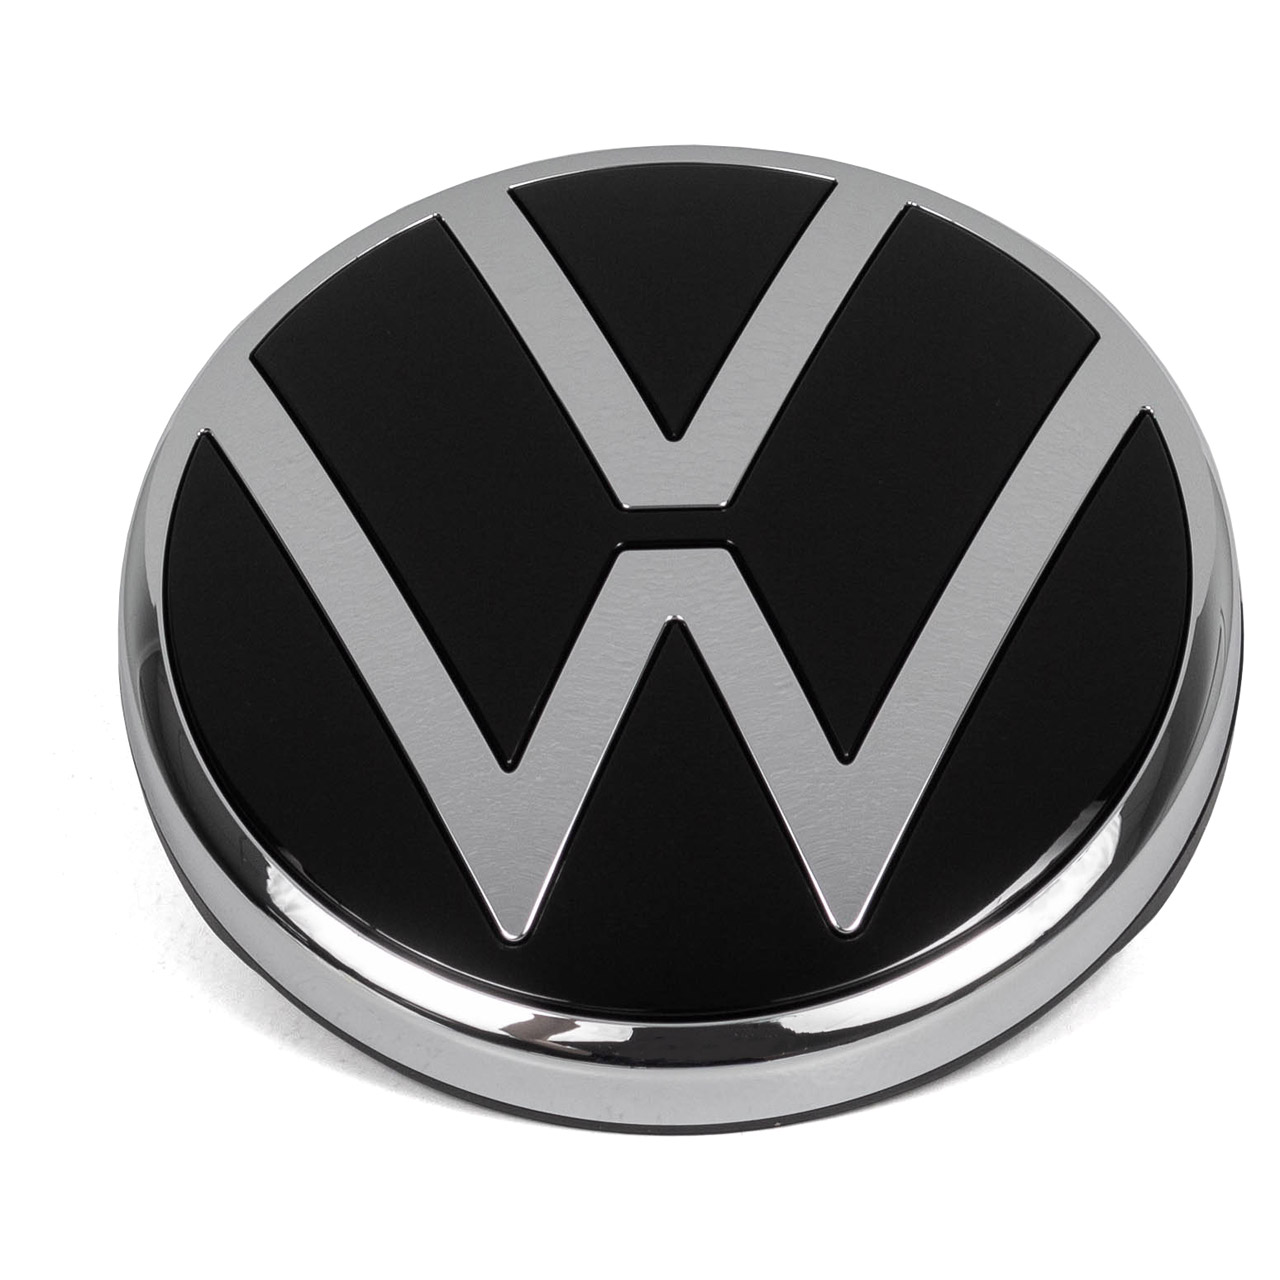 ORIGINAL VW Emblem Logo Heckklappe T-Roc A11 AC7 Arteon Shooting Break 5H0853630 DPJ